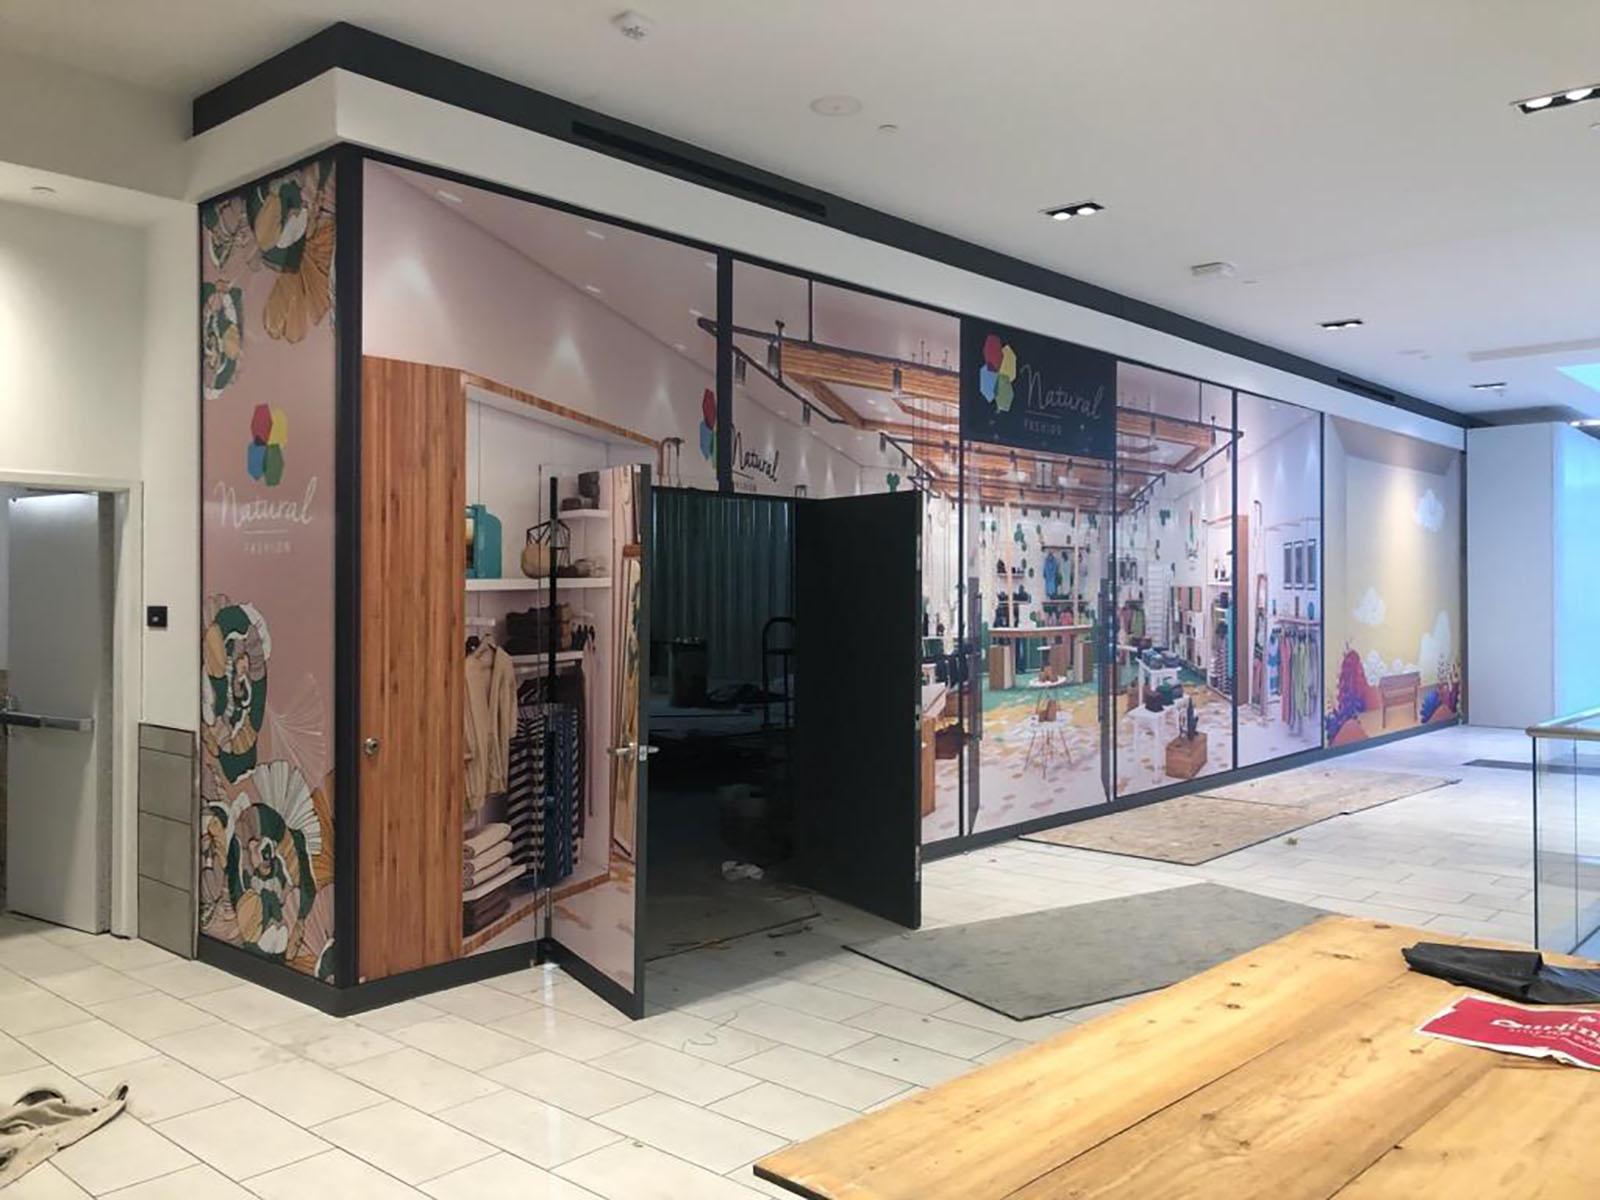 2019-09-14 3DWD (Fashion District Phila) - Barricade Wrap (Space #2170)